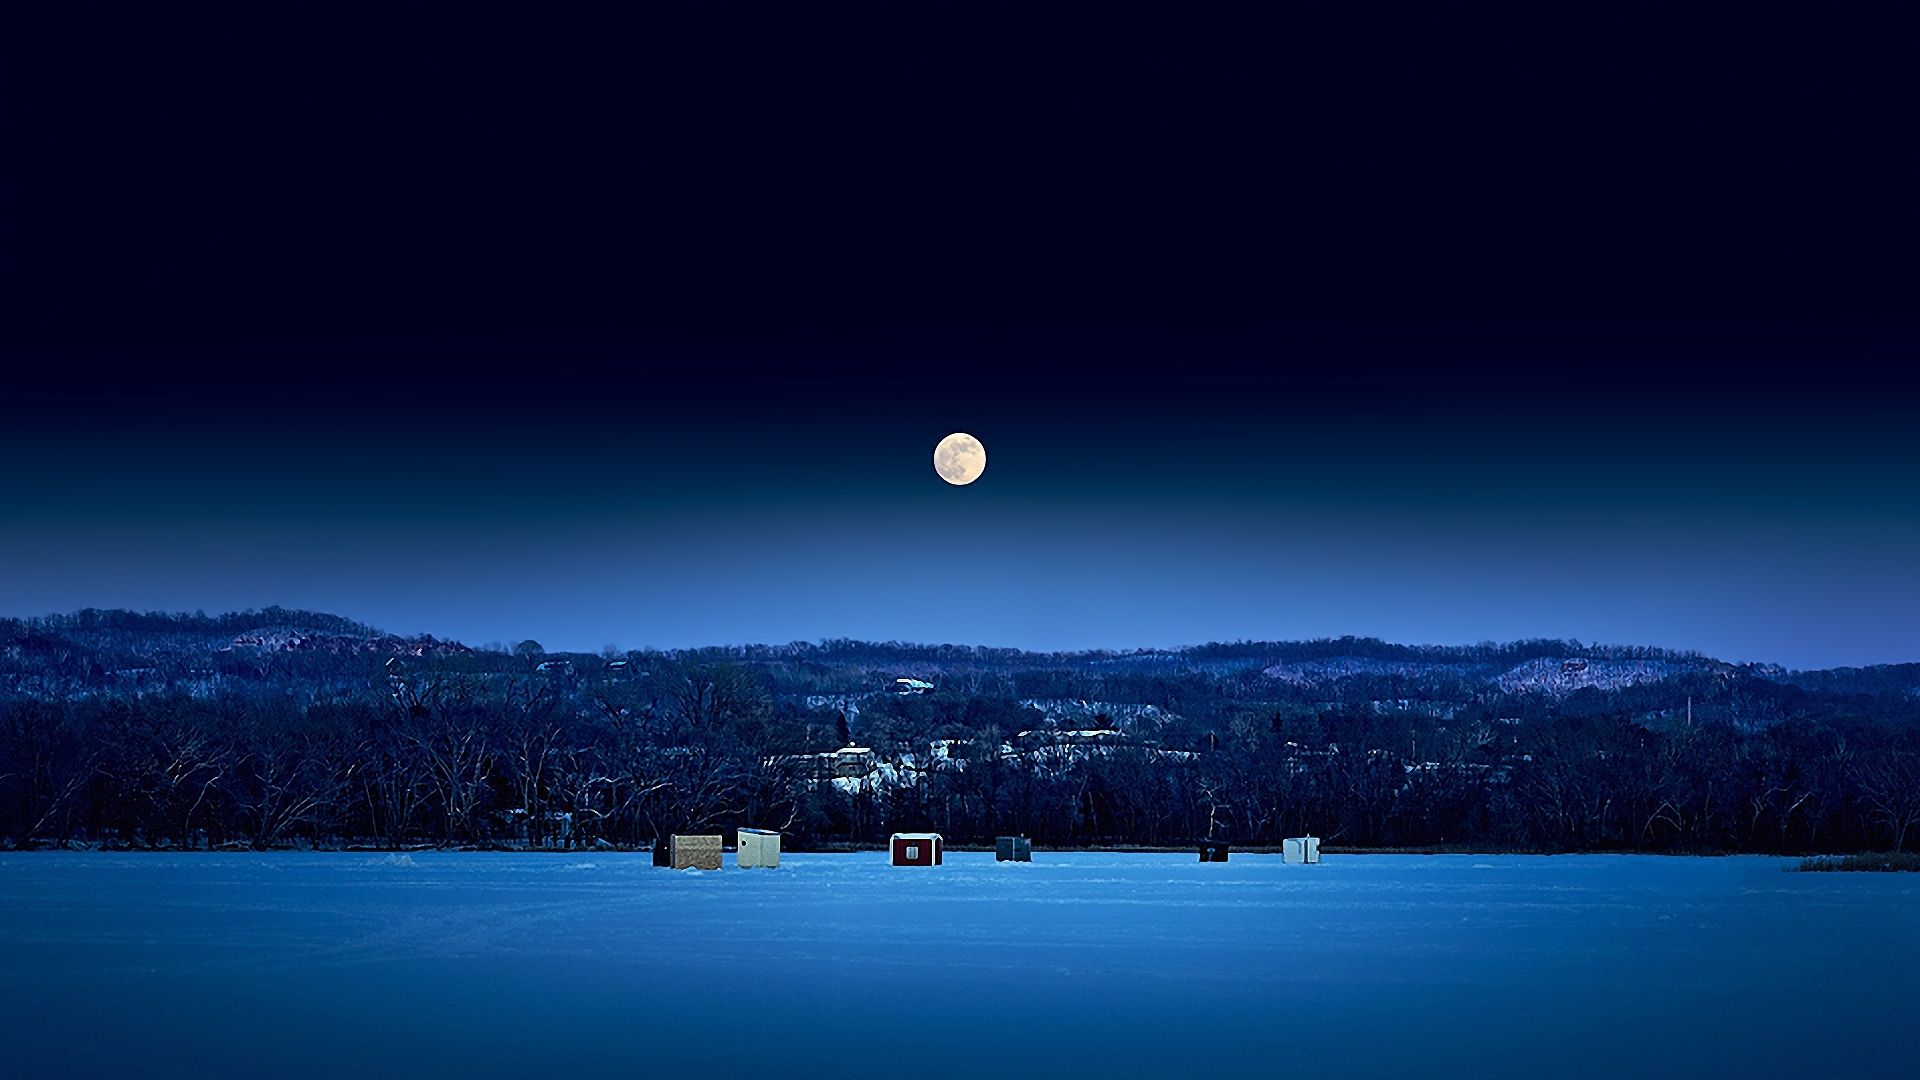 night sky wallpaper landscape